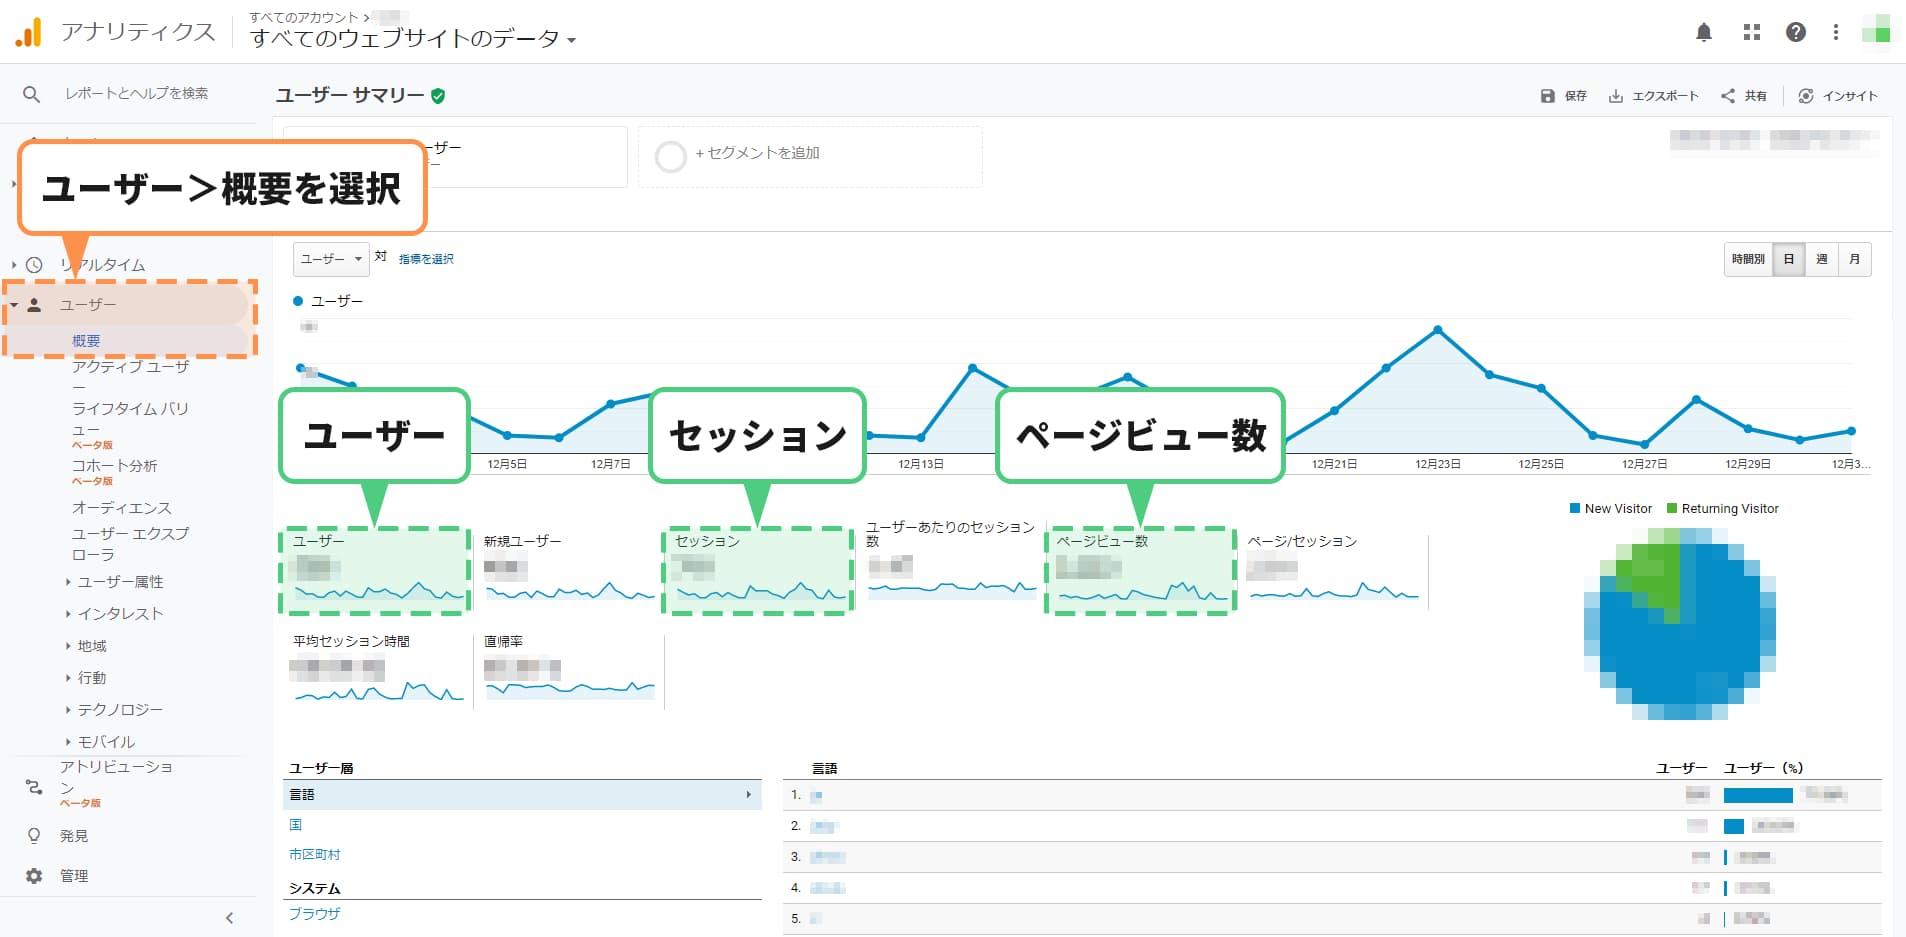 analysis_4points_img1